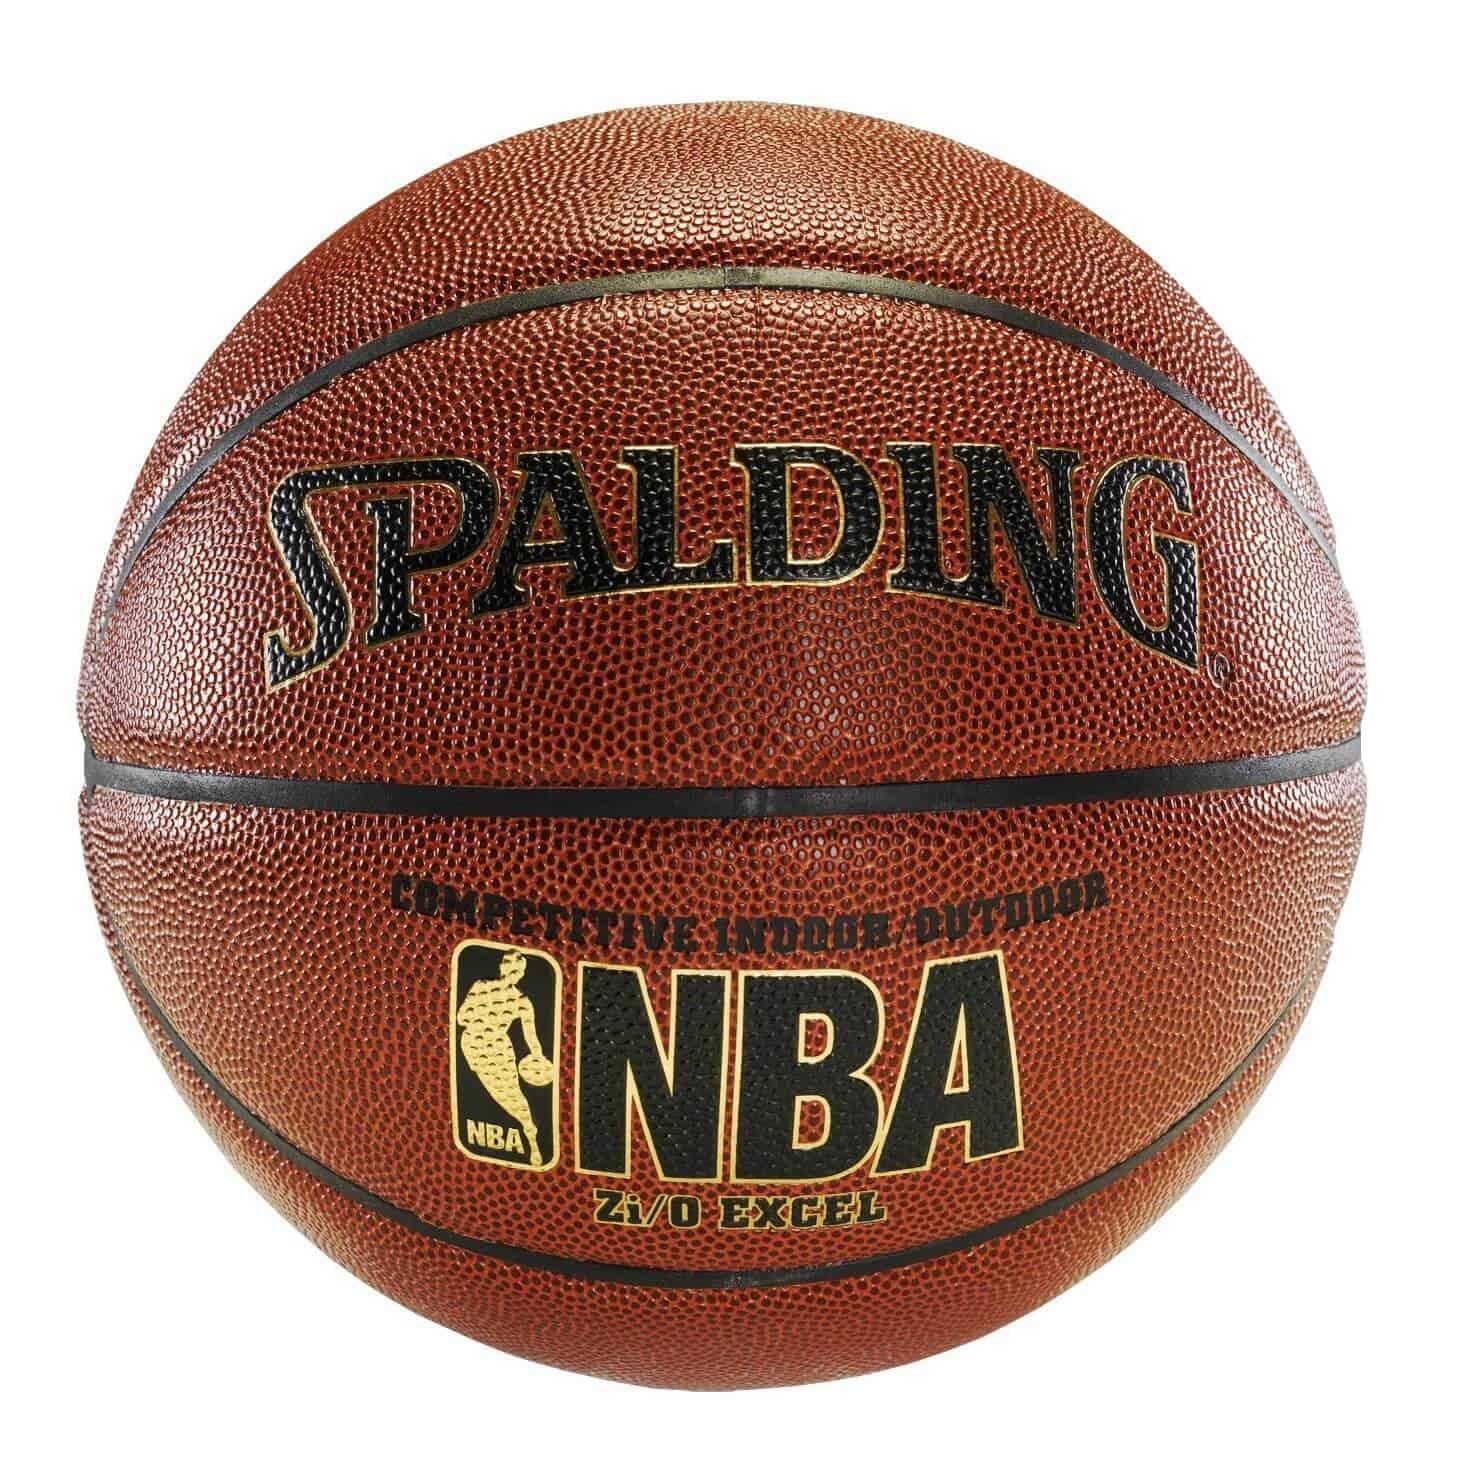 Outdoor Basketball Chart - BestOutdoorBasketball